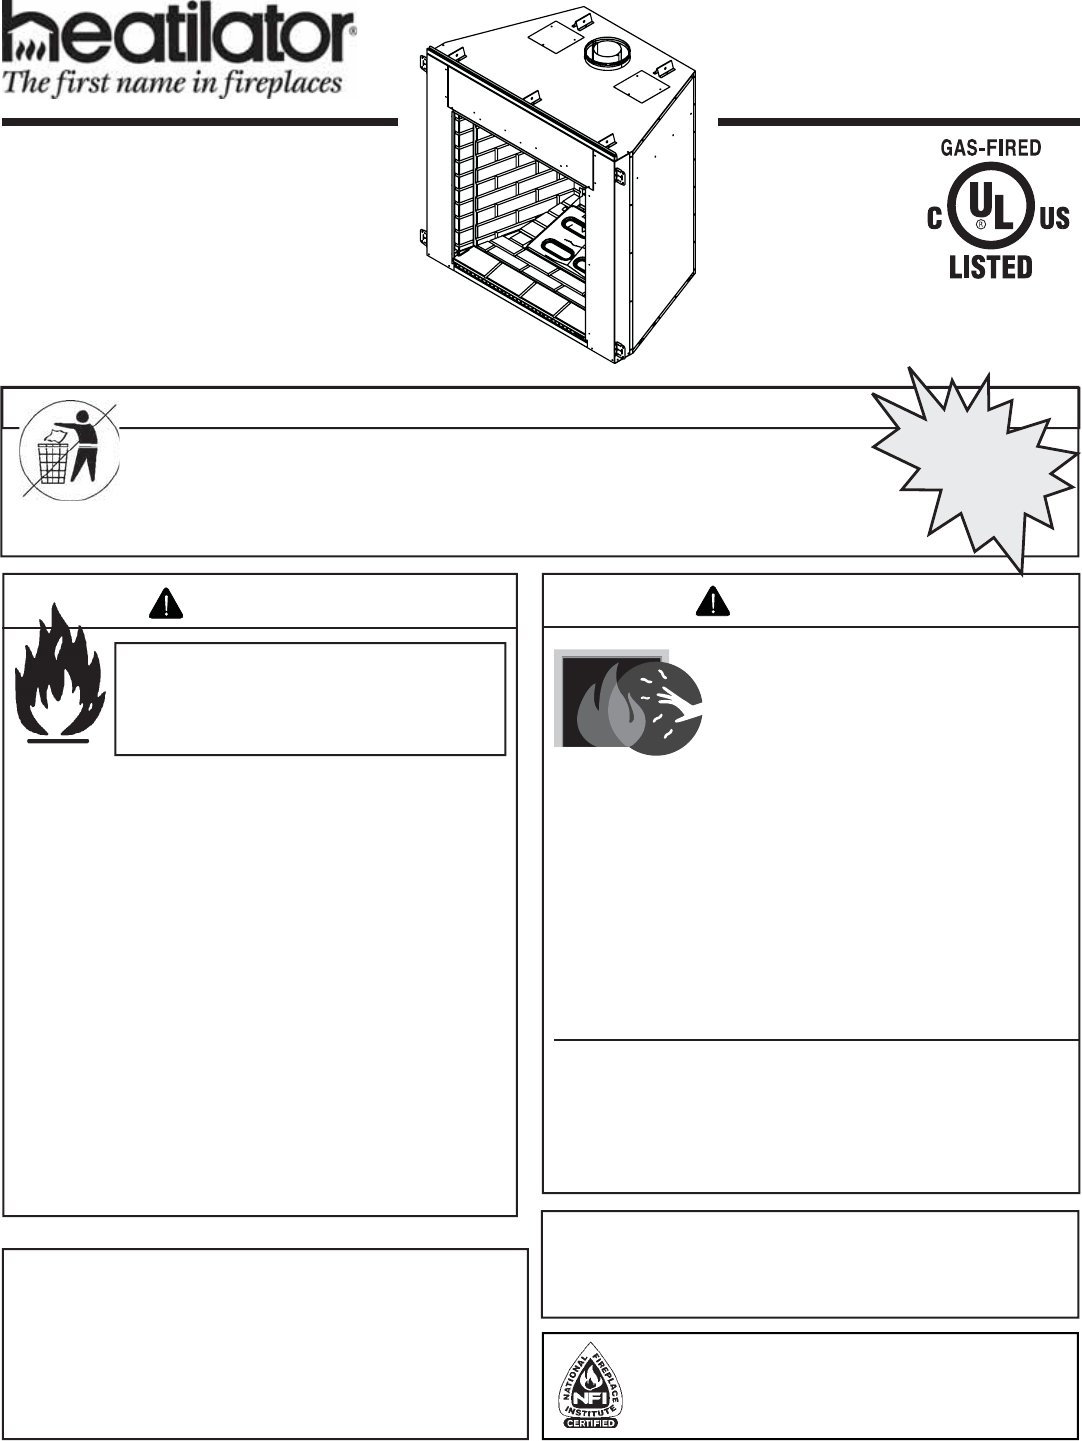 hight resolution of heatilator icon dv idv series 4042 575 rev s 5 11 1